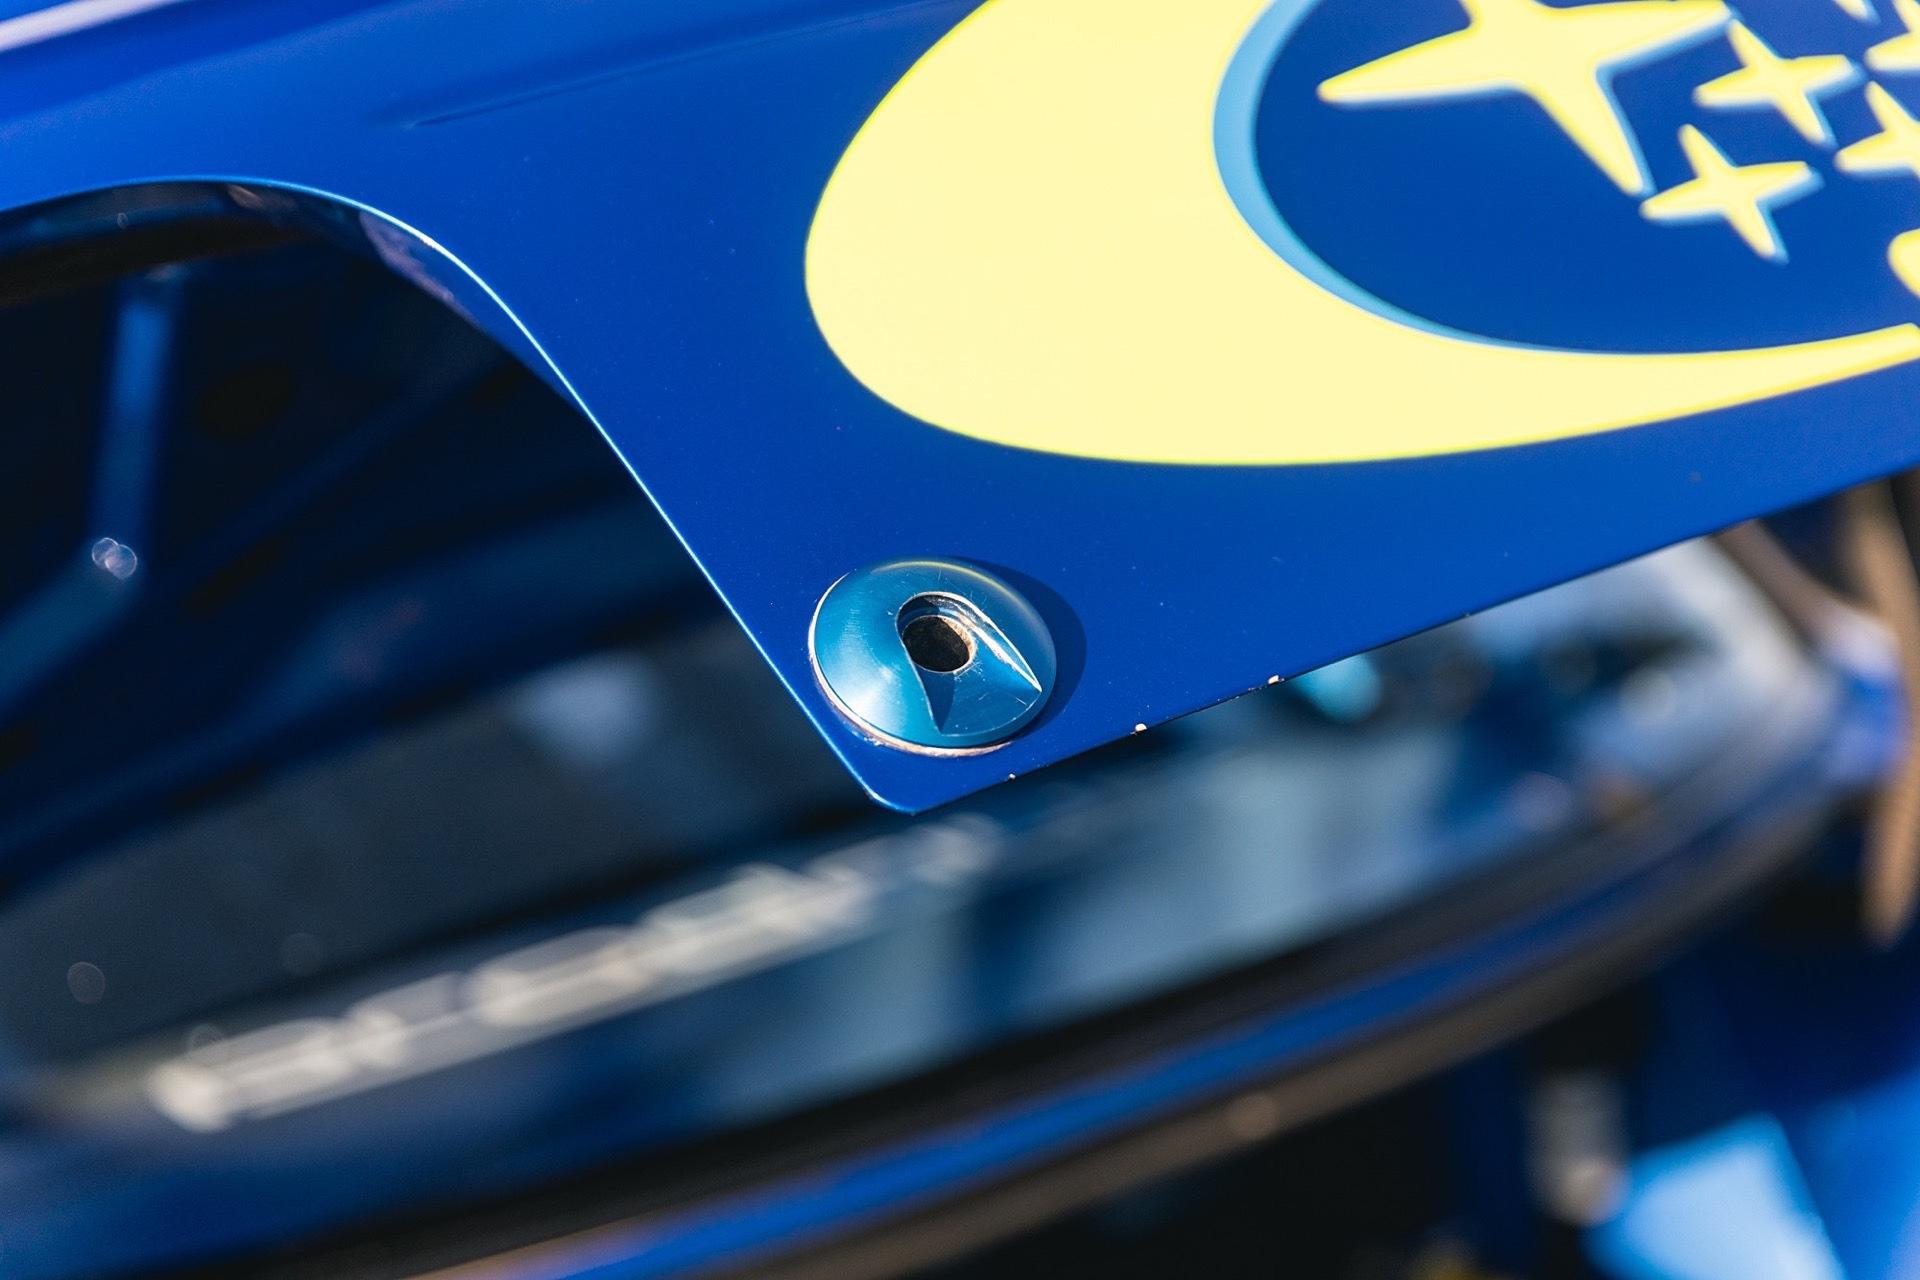 Richard_Burns_Subaru_Impreza_WRC_sale-0008